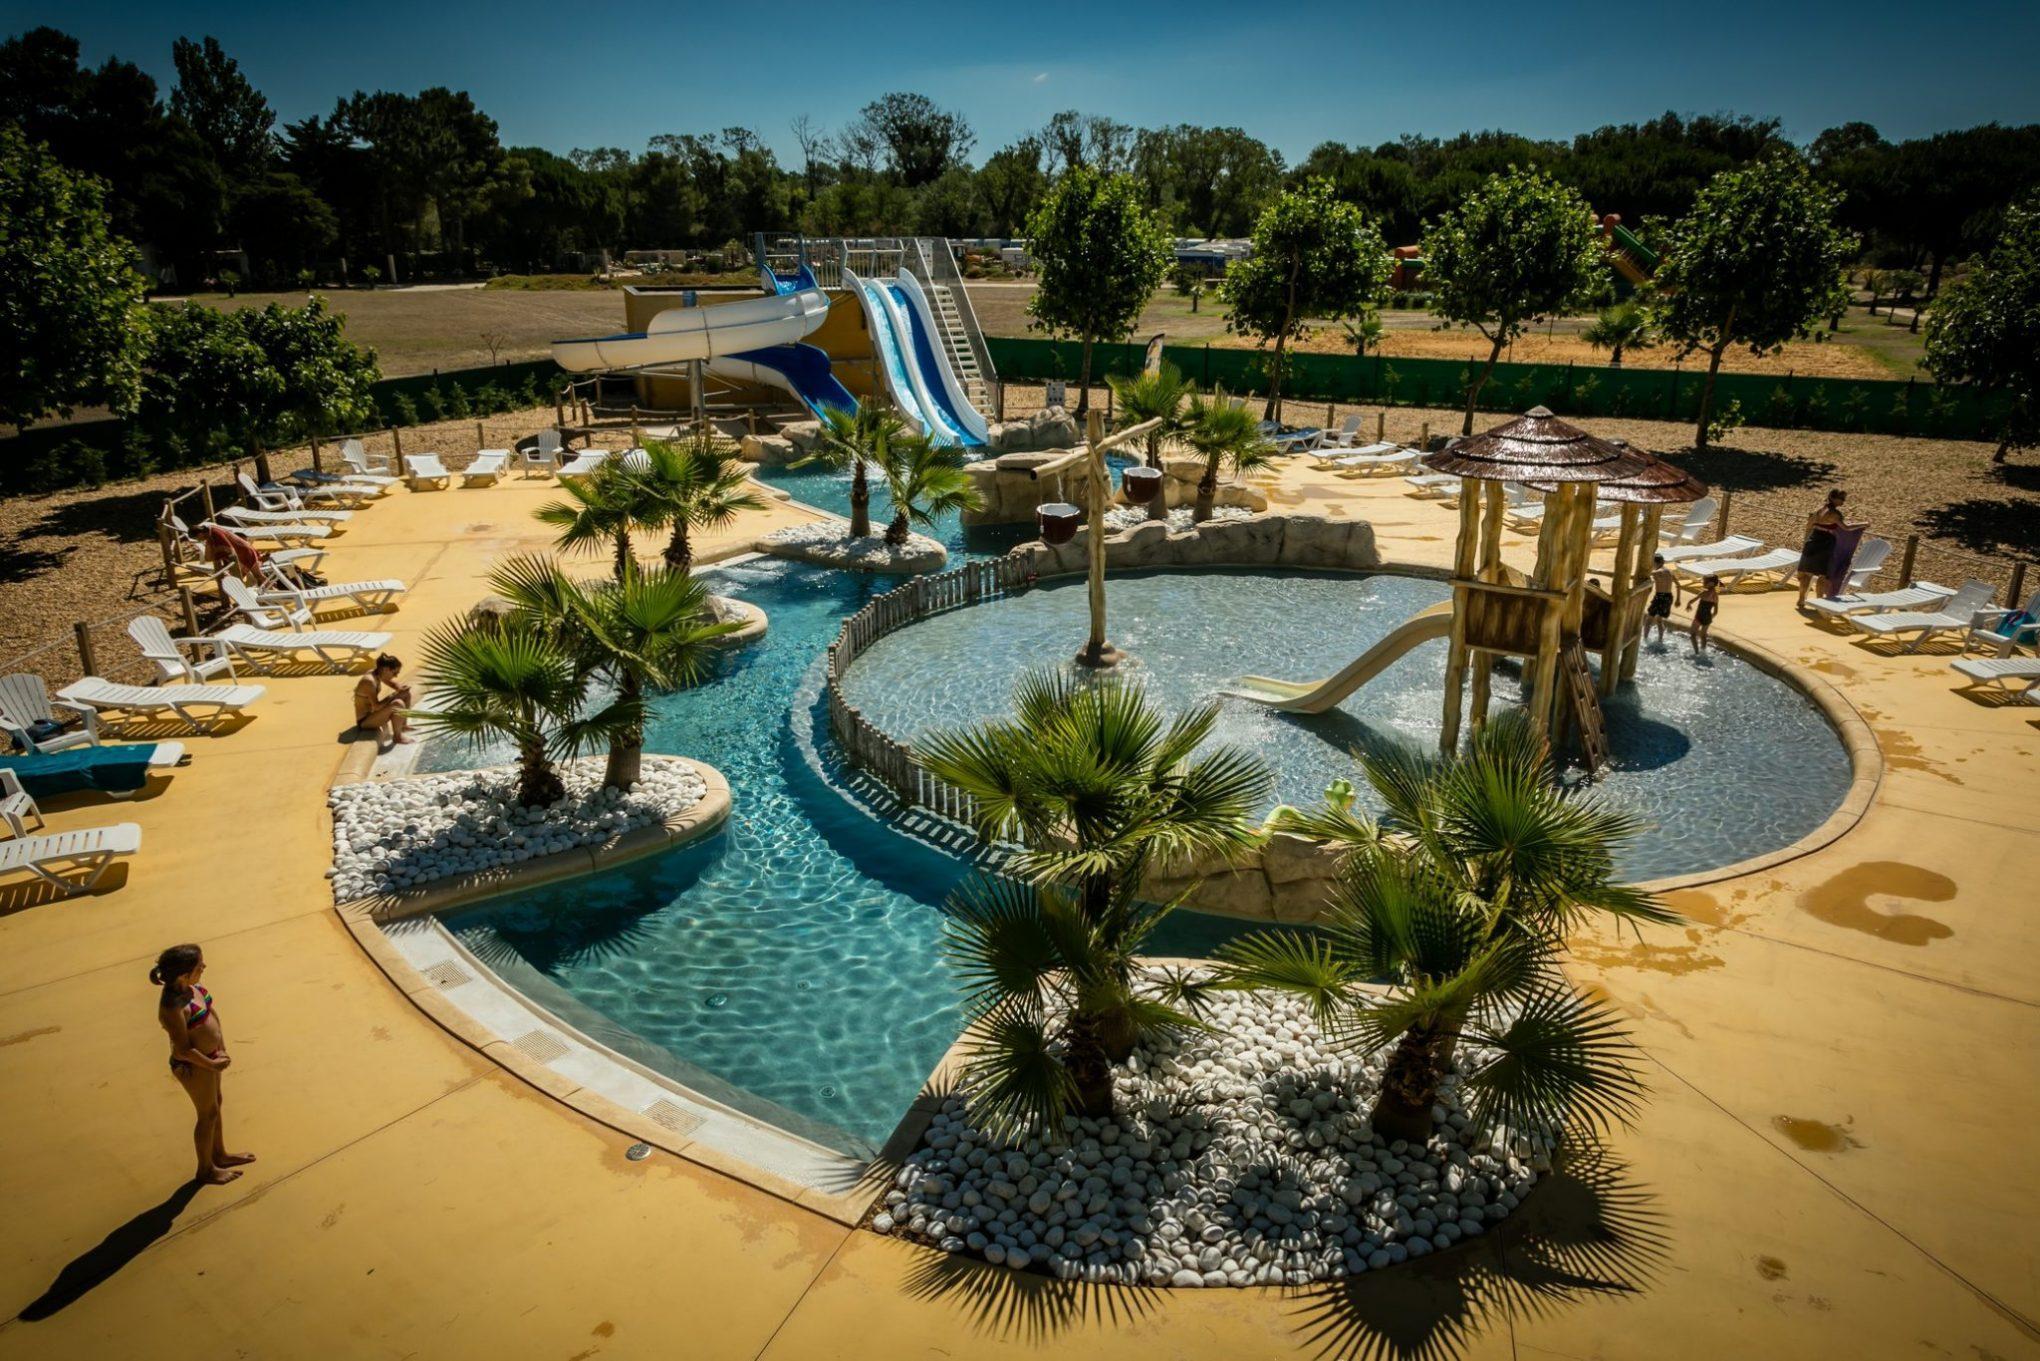 Aquapark camping Le Sainte Marie